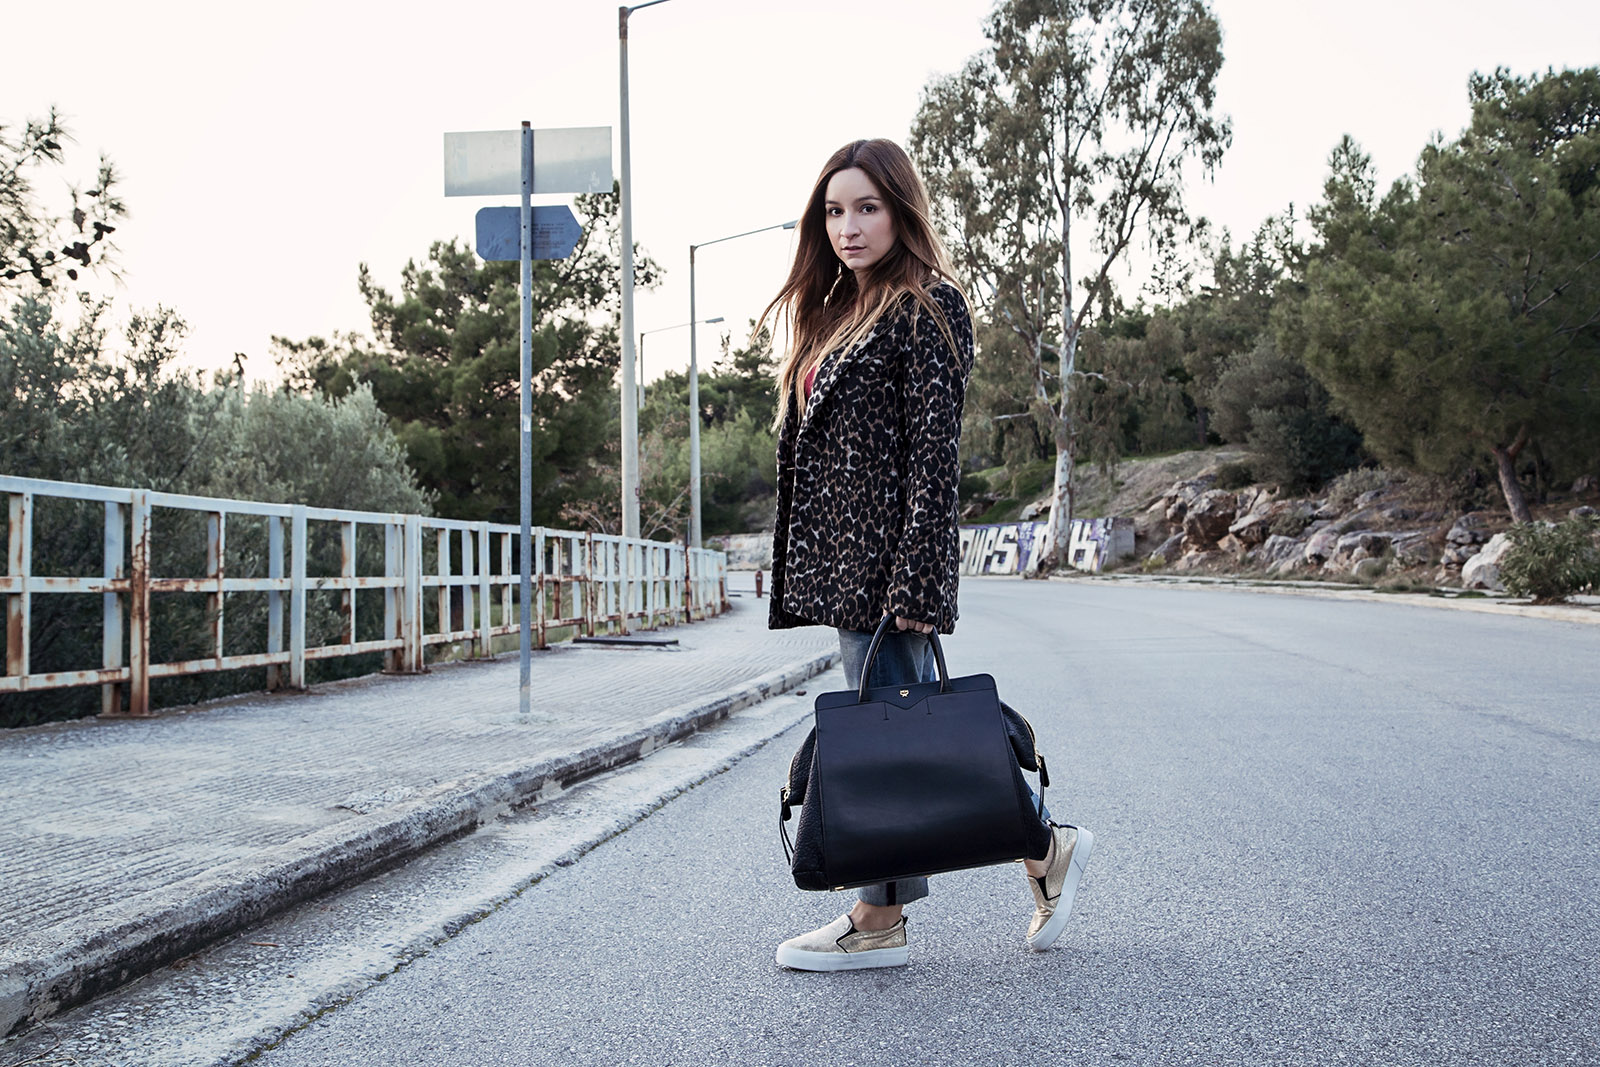 af225619358 Jeans: Replay   Bag: MCM   Shoes: Bershka   Blouse: Mango   Coat: Forever 21